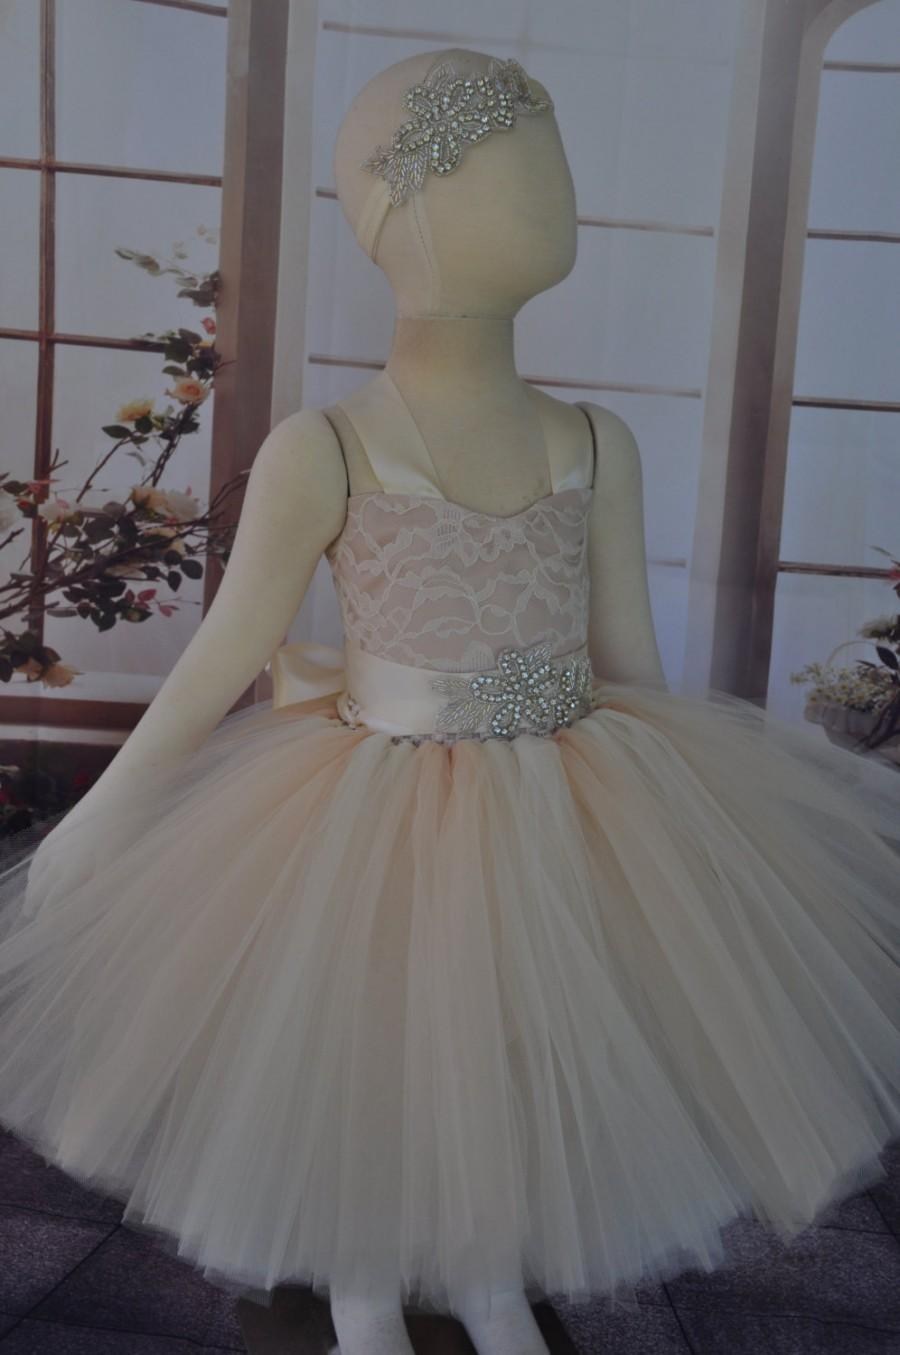 Wedding - Ivory Lace Champagne Flower Girl Dress, Lace Ivory Champagne Toddler Dress, Vintage Inspired Flower Girl, Ivory Champagne Baby Dress,